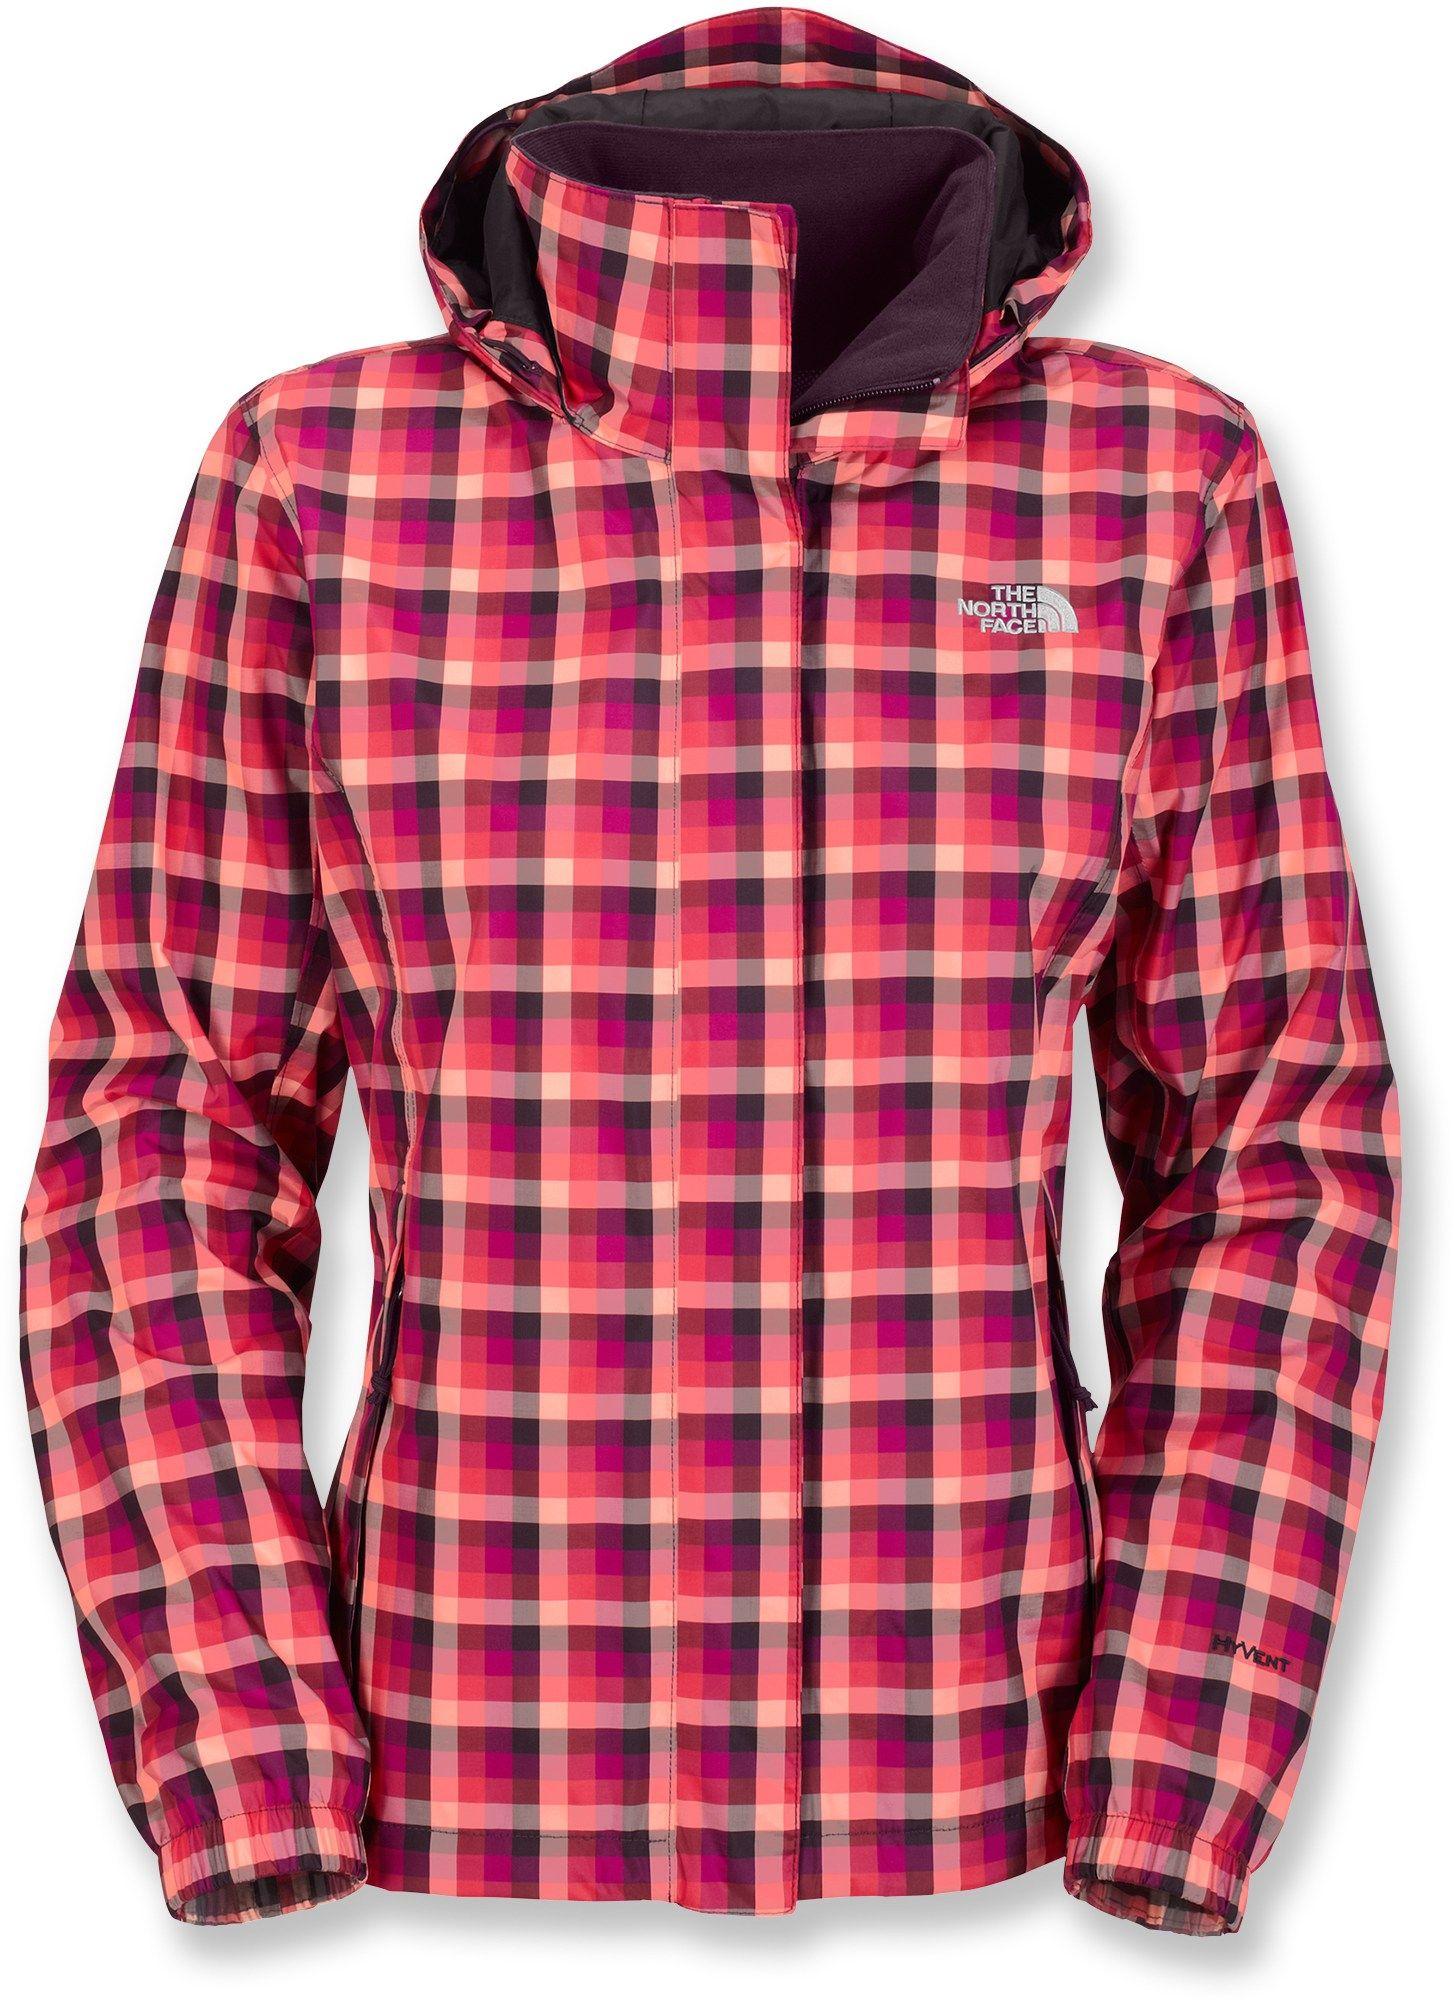 The North Face Novelty Resolve Rain Jacket Women S Free Shipping At Rei Com Rain Jacket Women Shop Womens Jackets Rain Jacket [ 2000 x 1454 Pixel ]